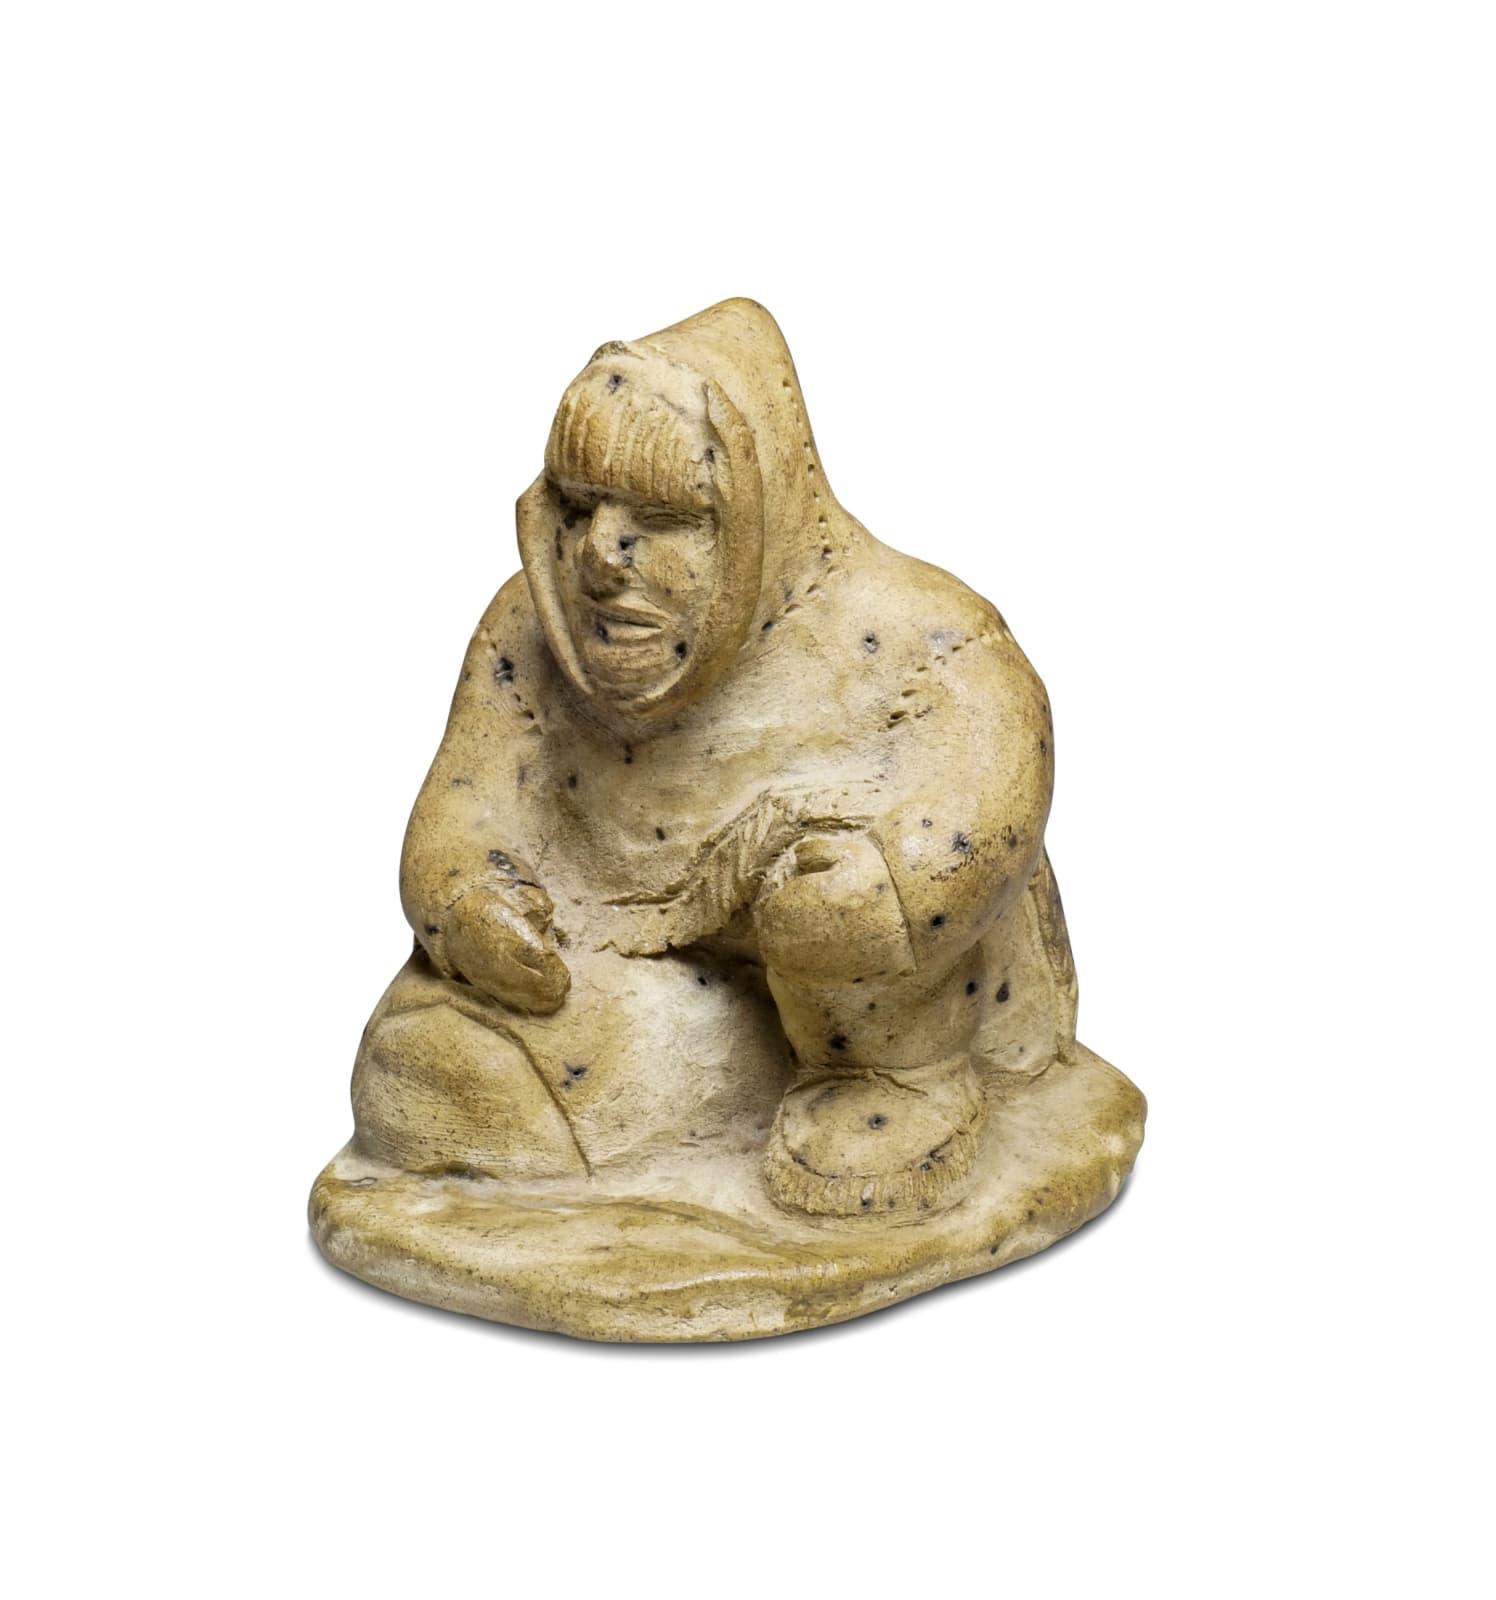 LAURENT AKSADJUAK (1935-2002) KANGIQLINIQ (RANKIN INLET) Seated Hunter, early 1970s ceramic, 3 x 2 1/2 x 3 in (7.6 x 6.3 x 7.6 cm) ESTIMATE: $500 — $800 New Price: $350